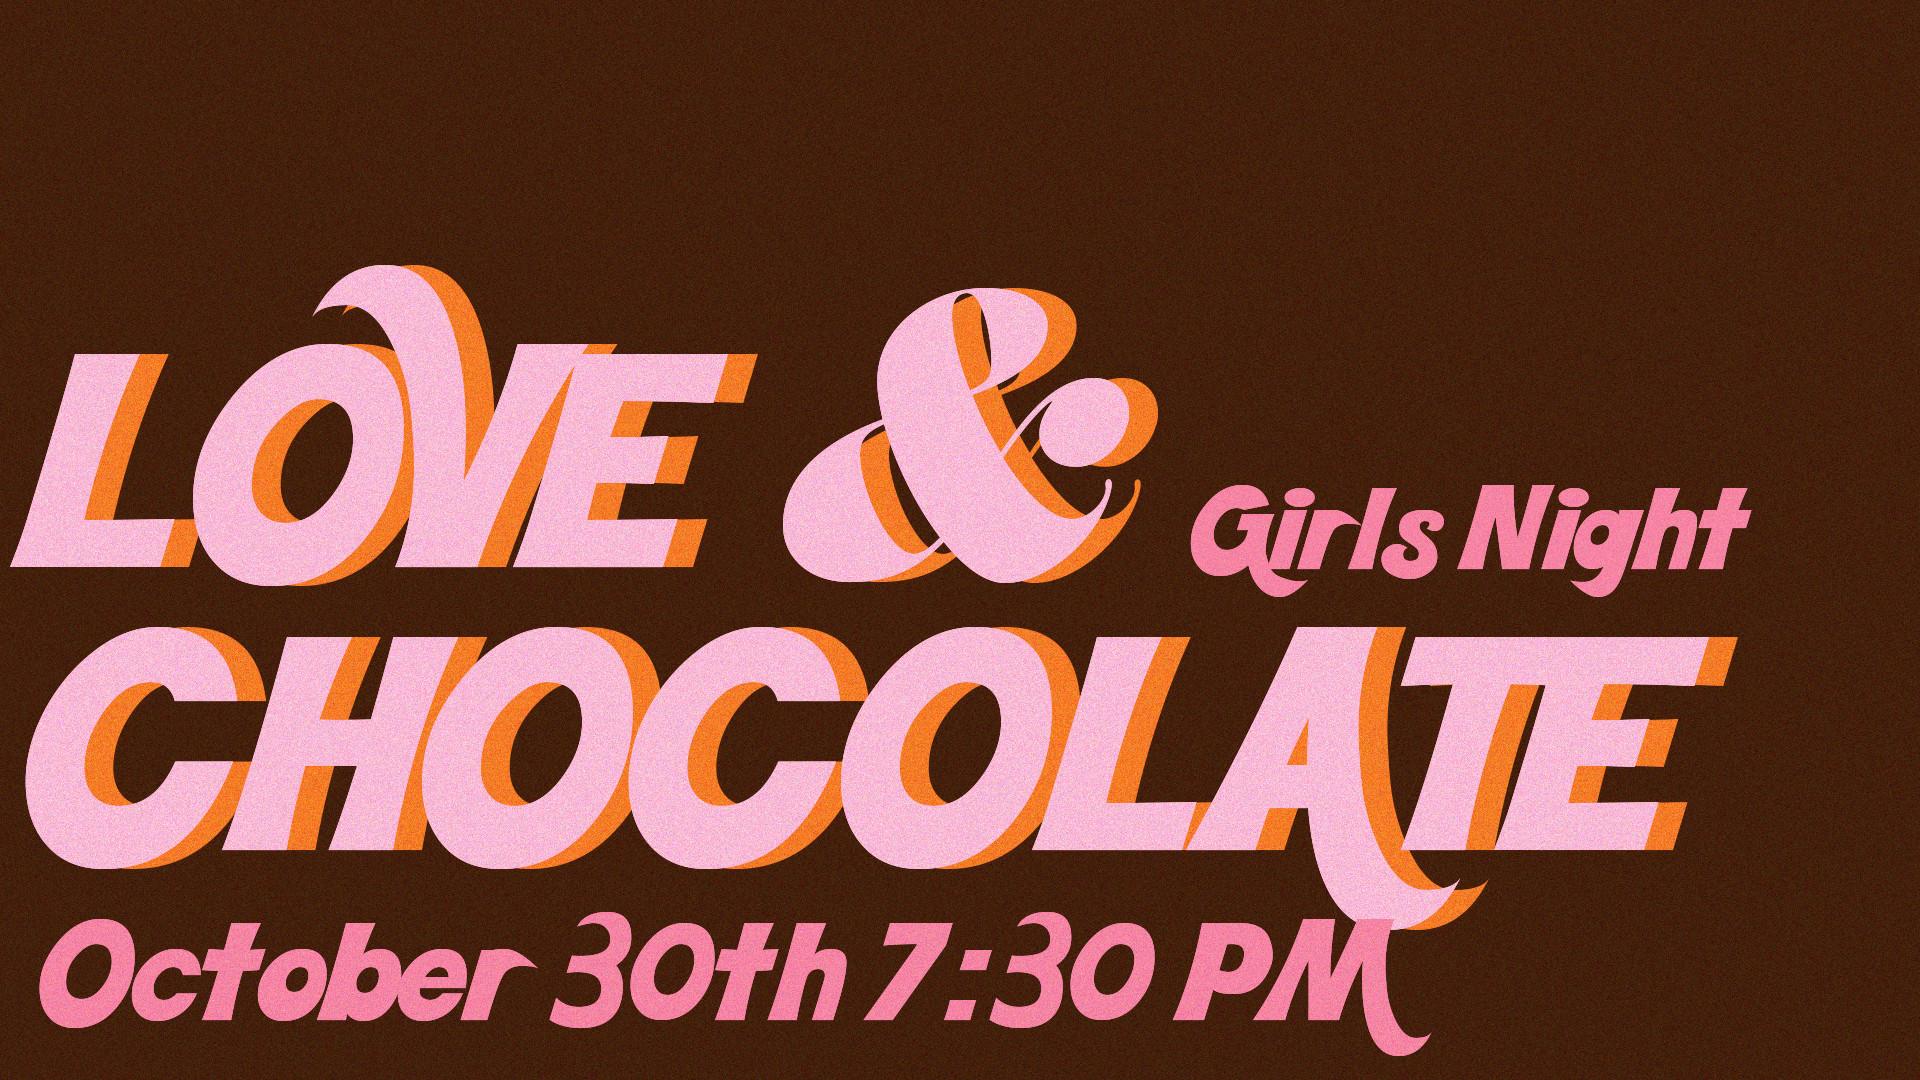 Love & Chocolate 2.jpg